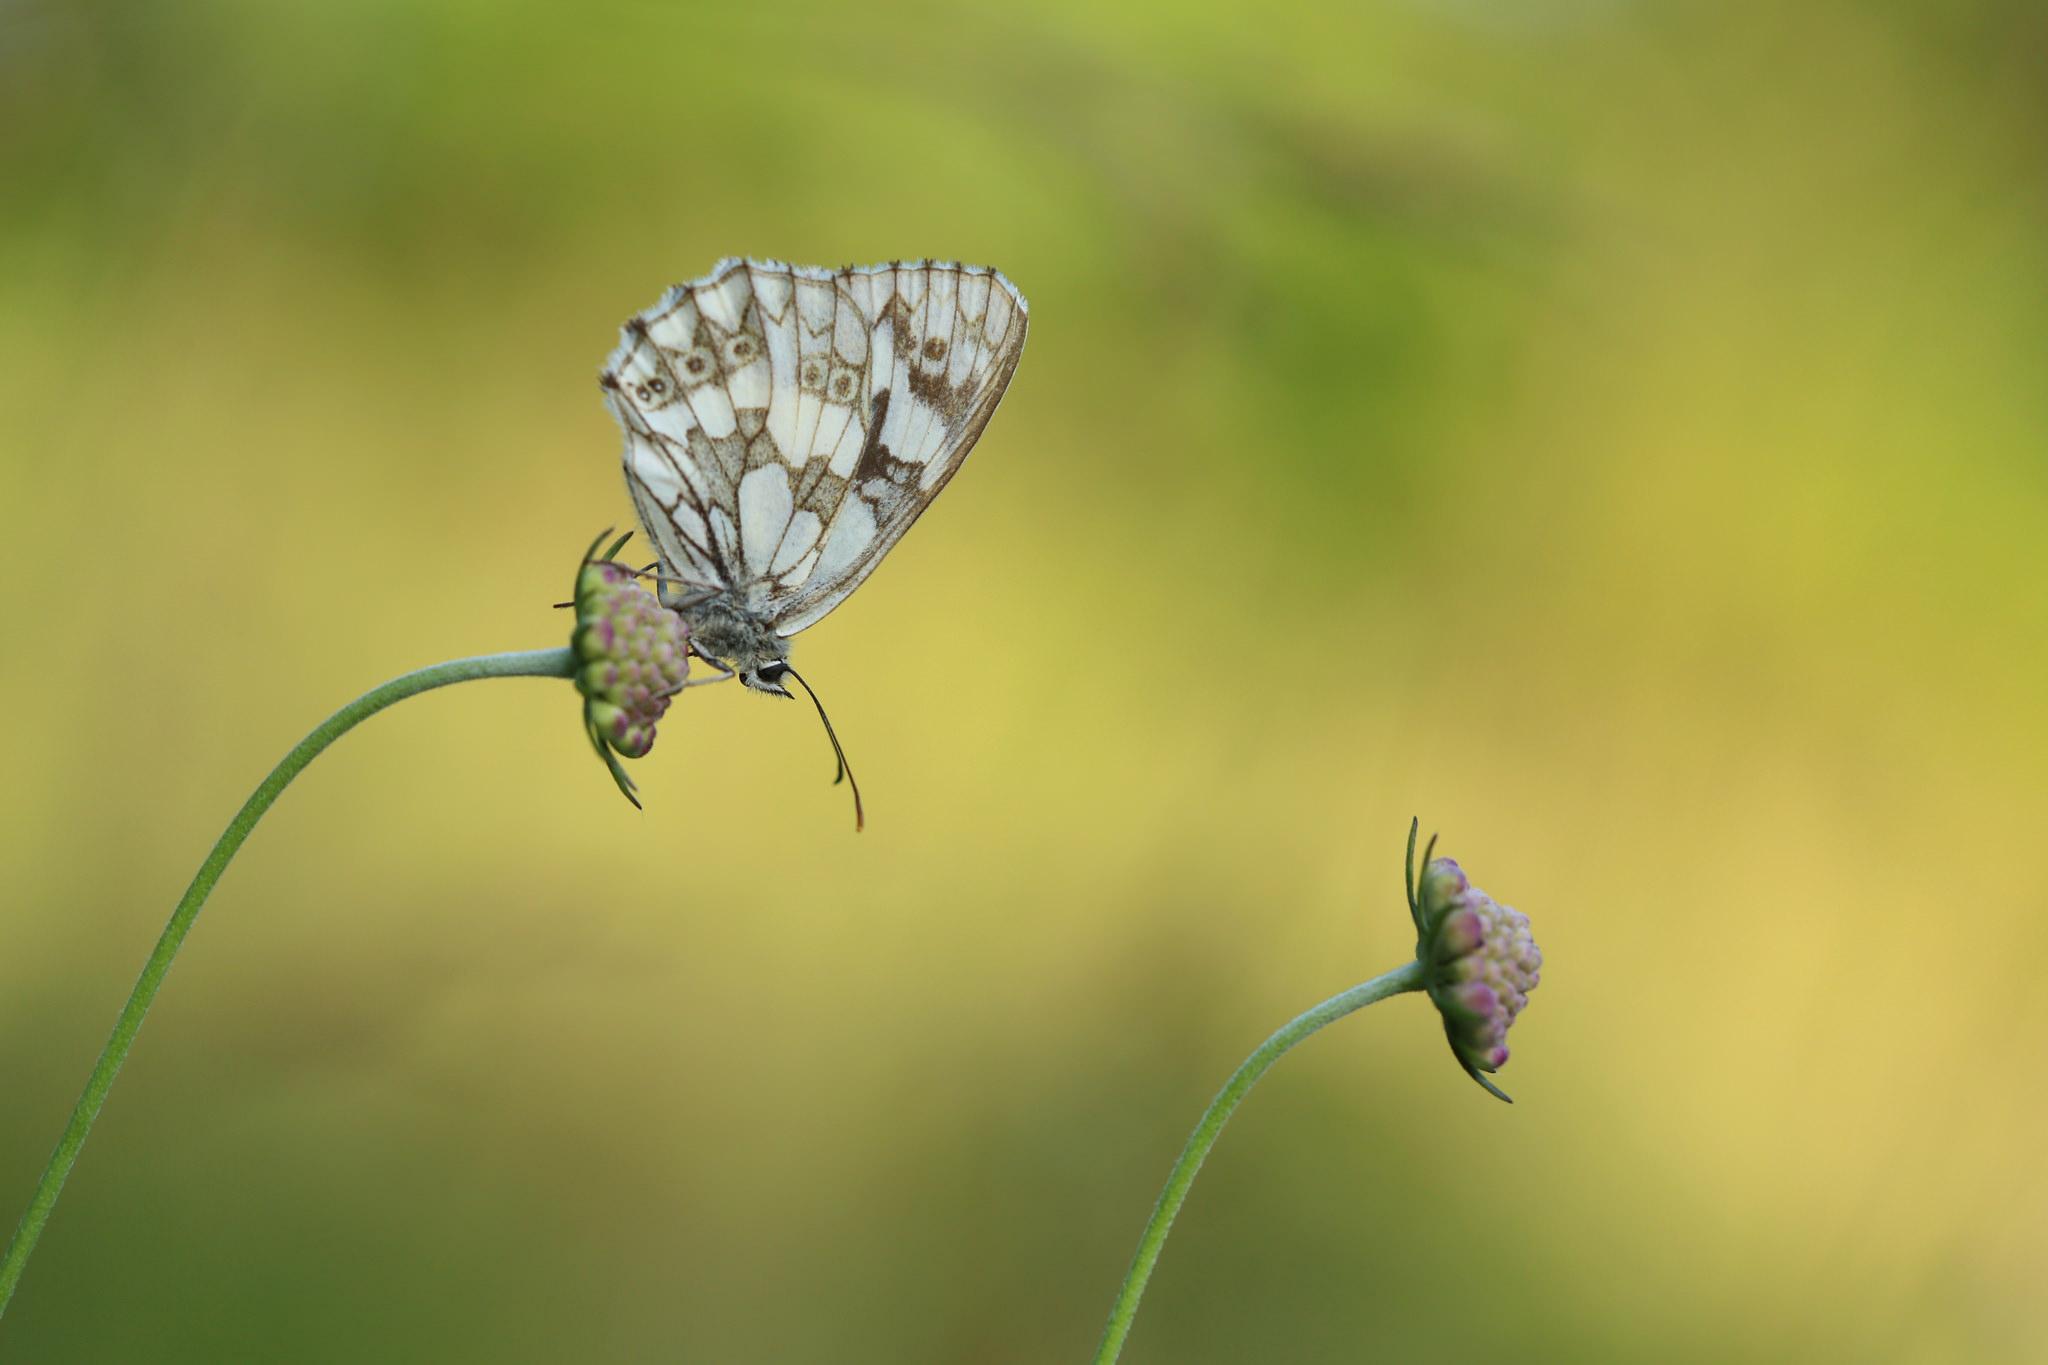 Mariposas en flores macro - 2048x1365